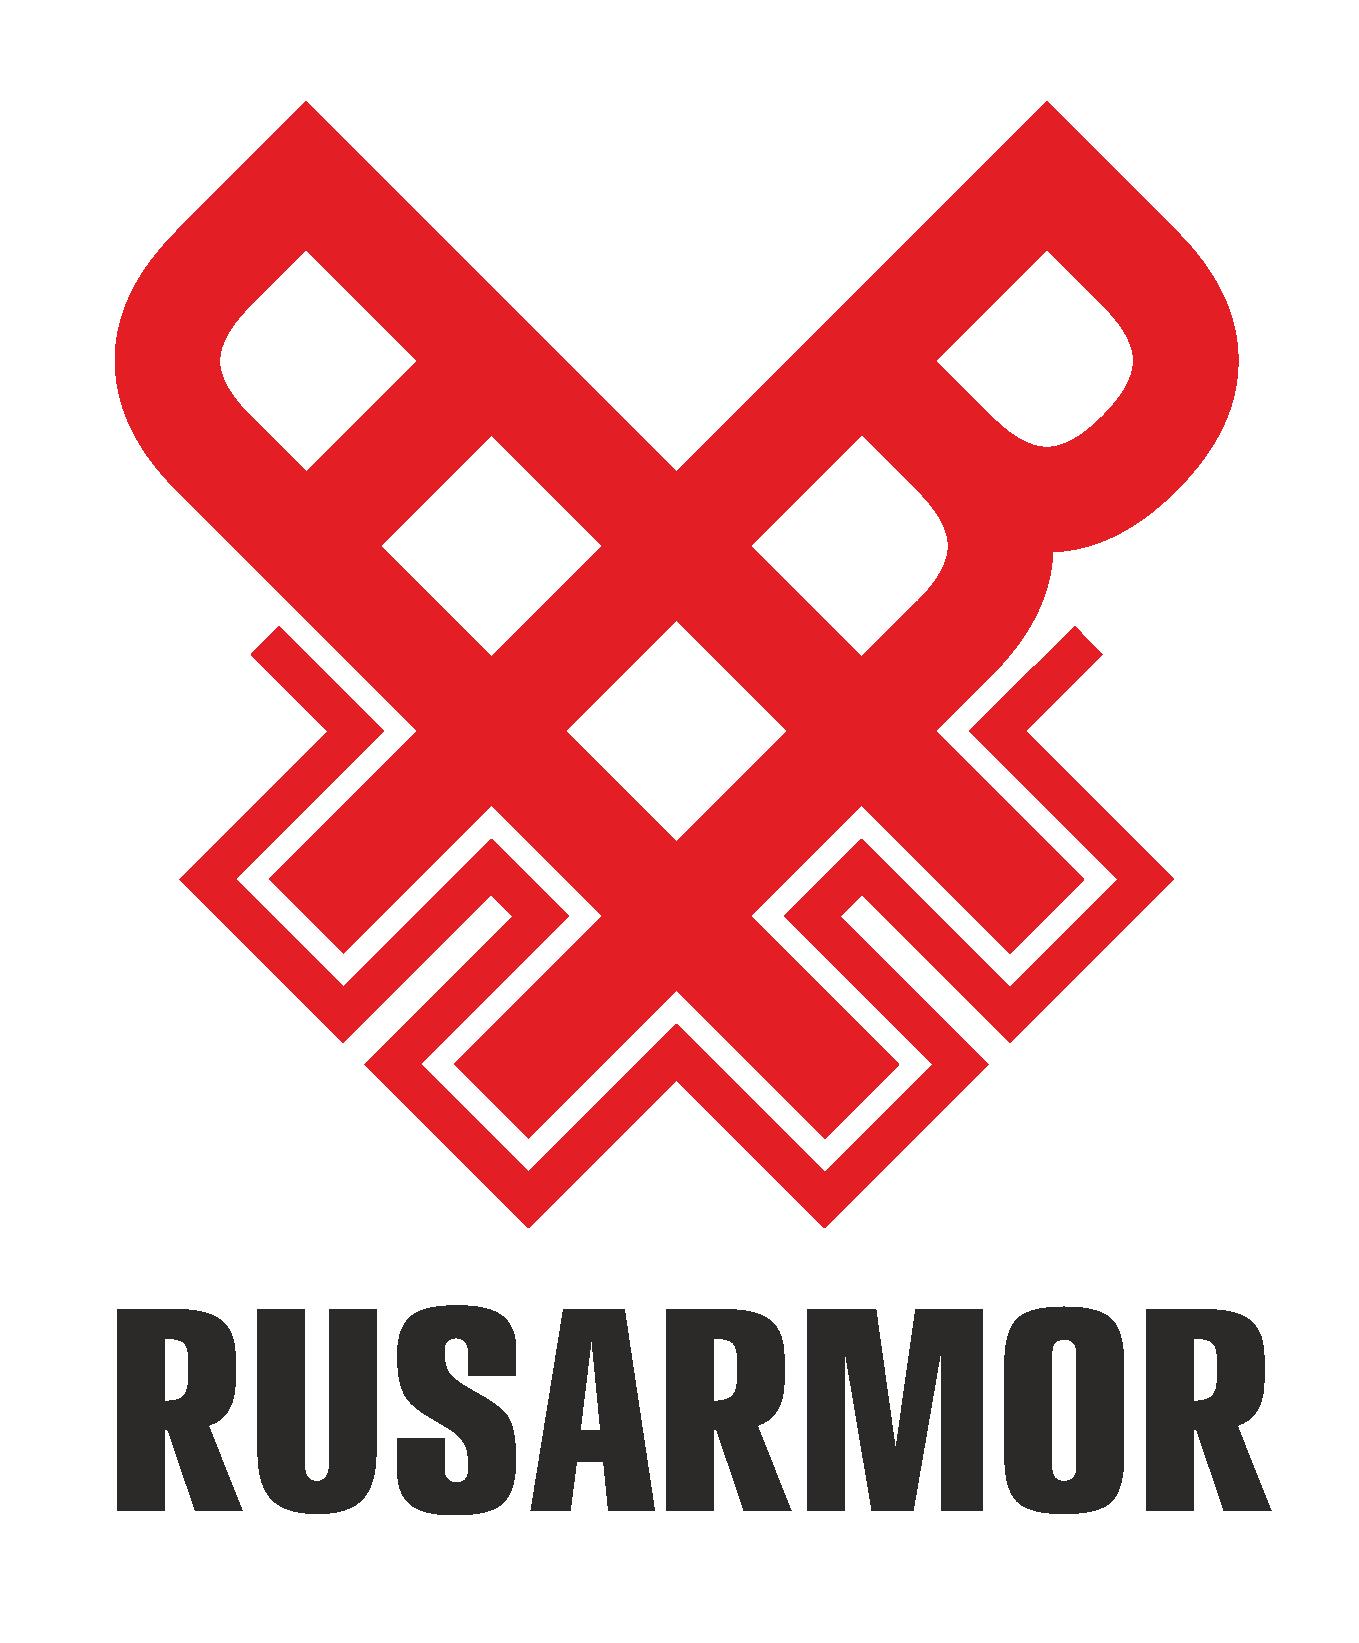 Разработка логотипа технологического стартапа РУСАРМОР фото f_0885a095aca8c89c.png